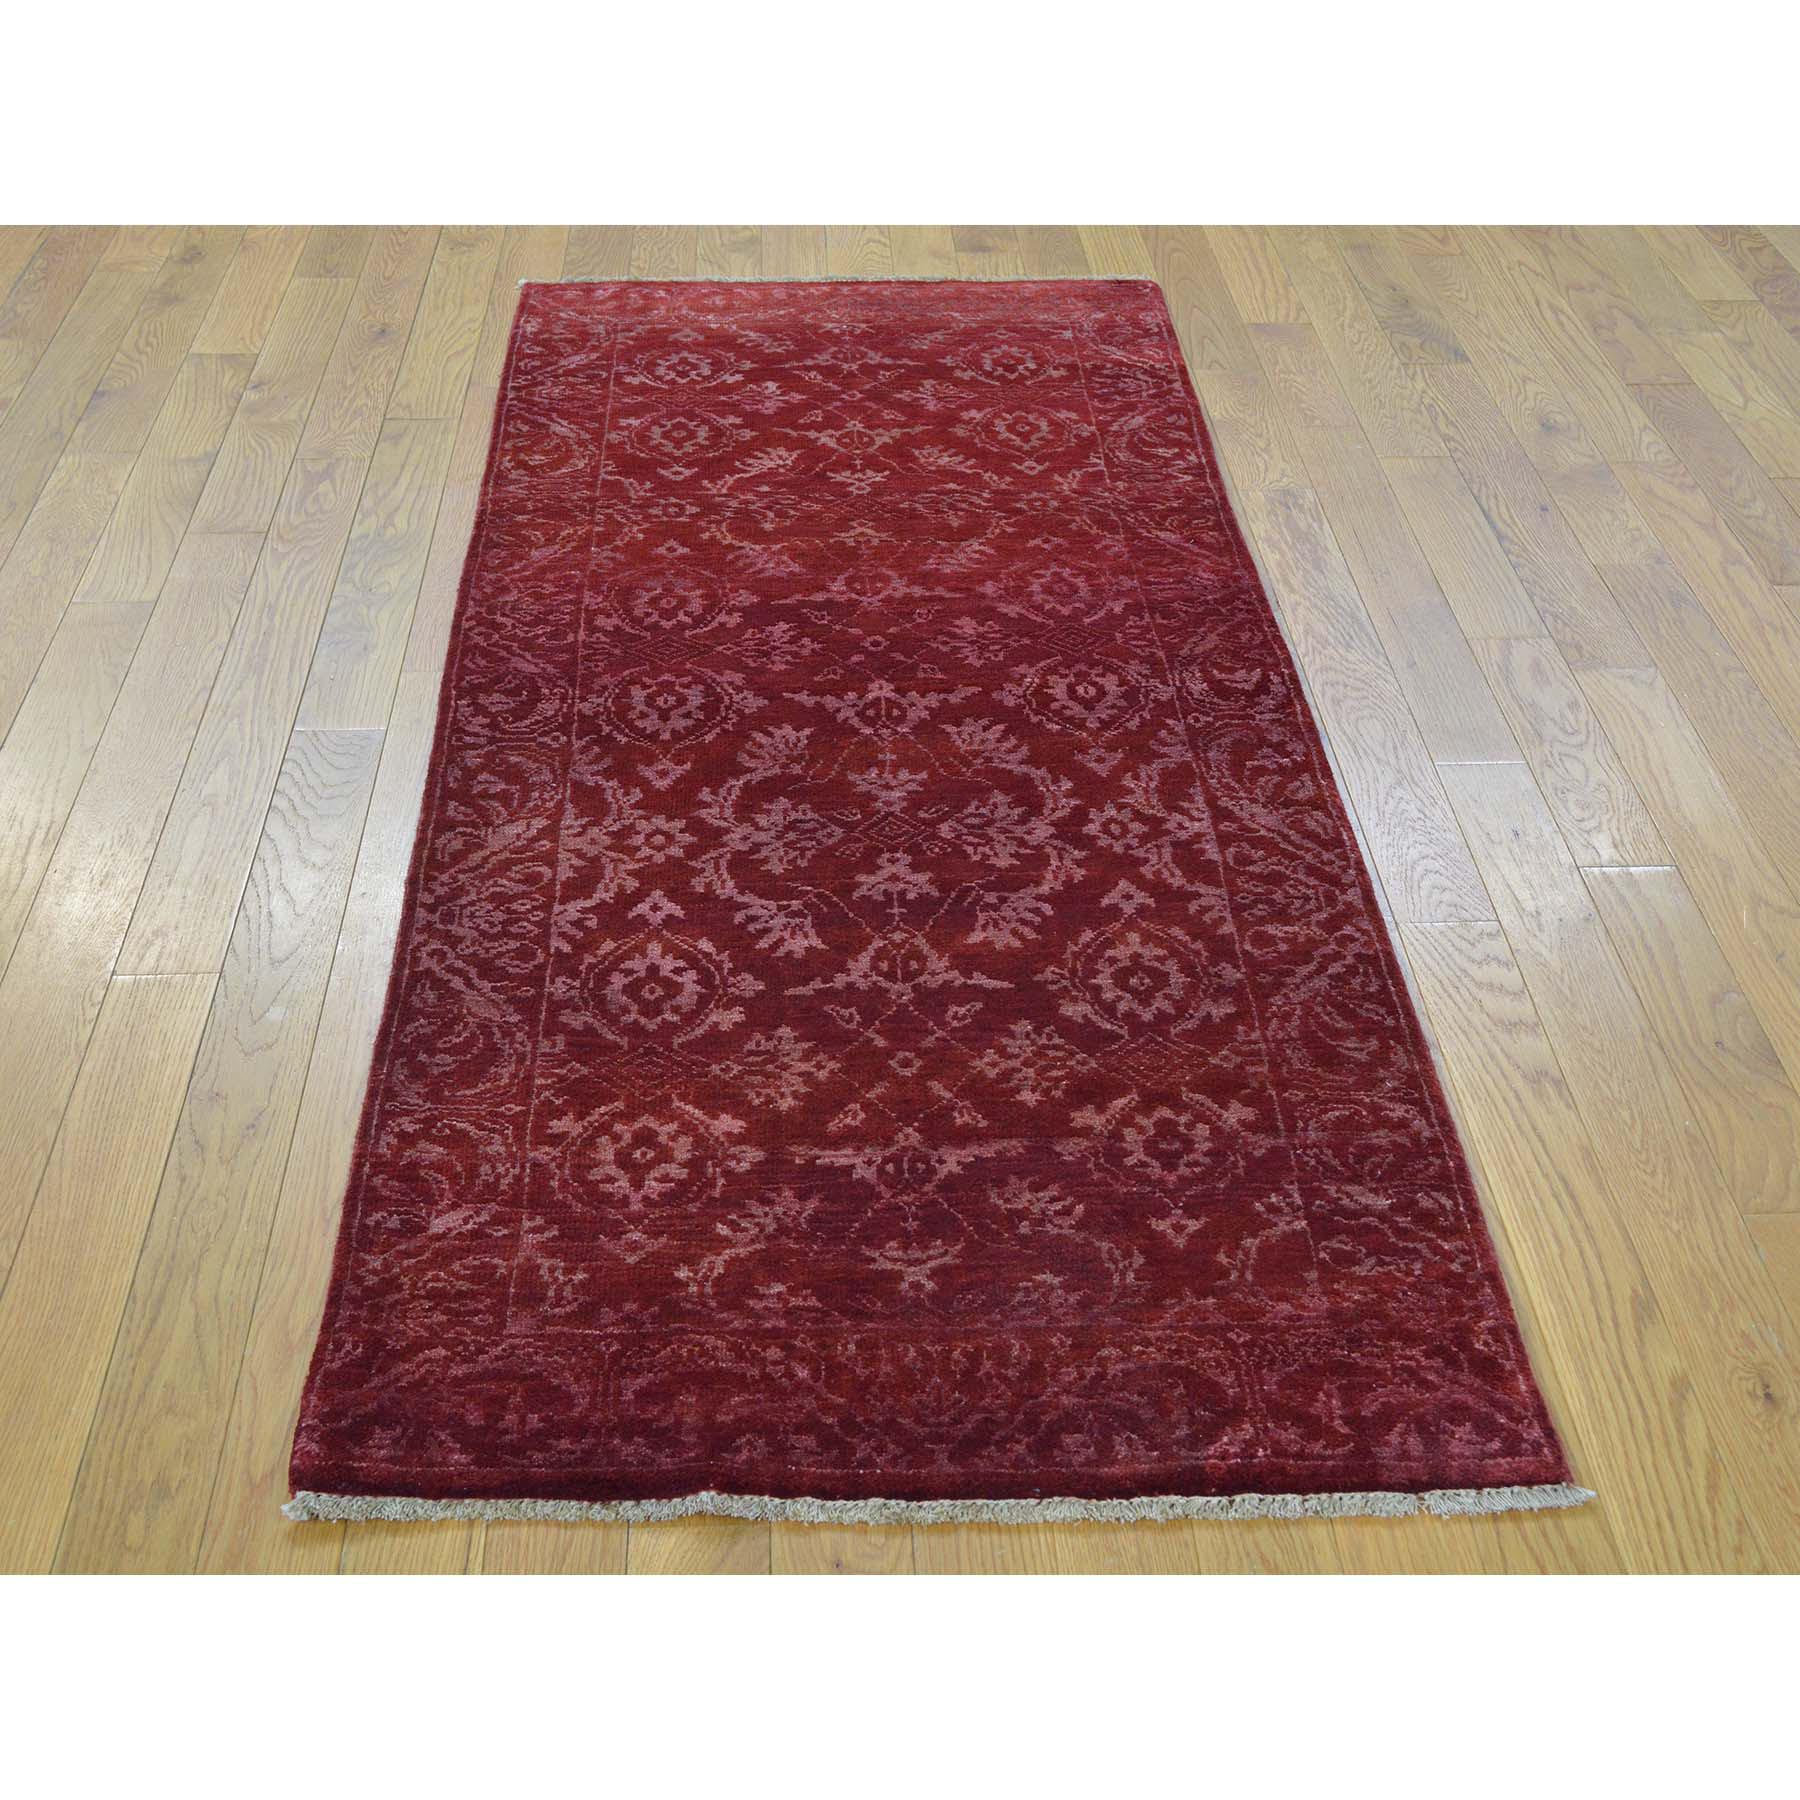 2-7 x6-4  Damask Wool and Silk Runner Tone on Tone Handmade Oriental Rug